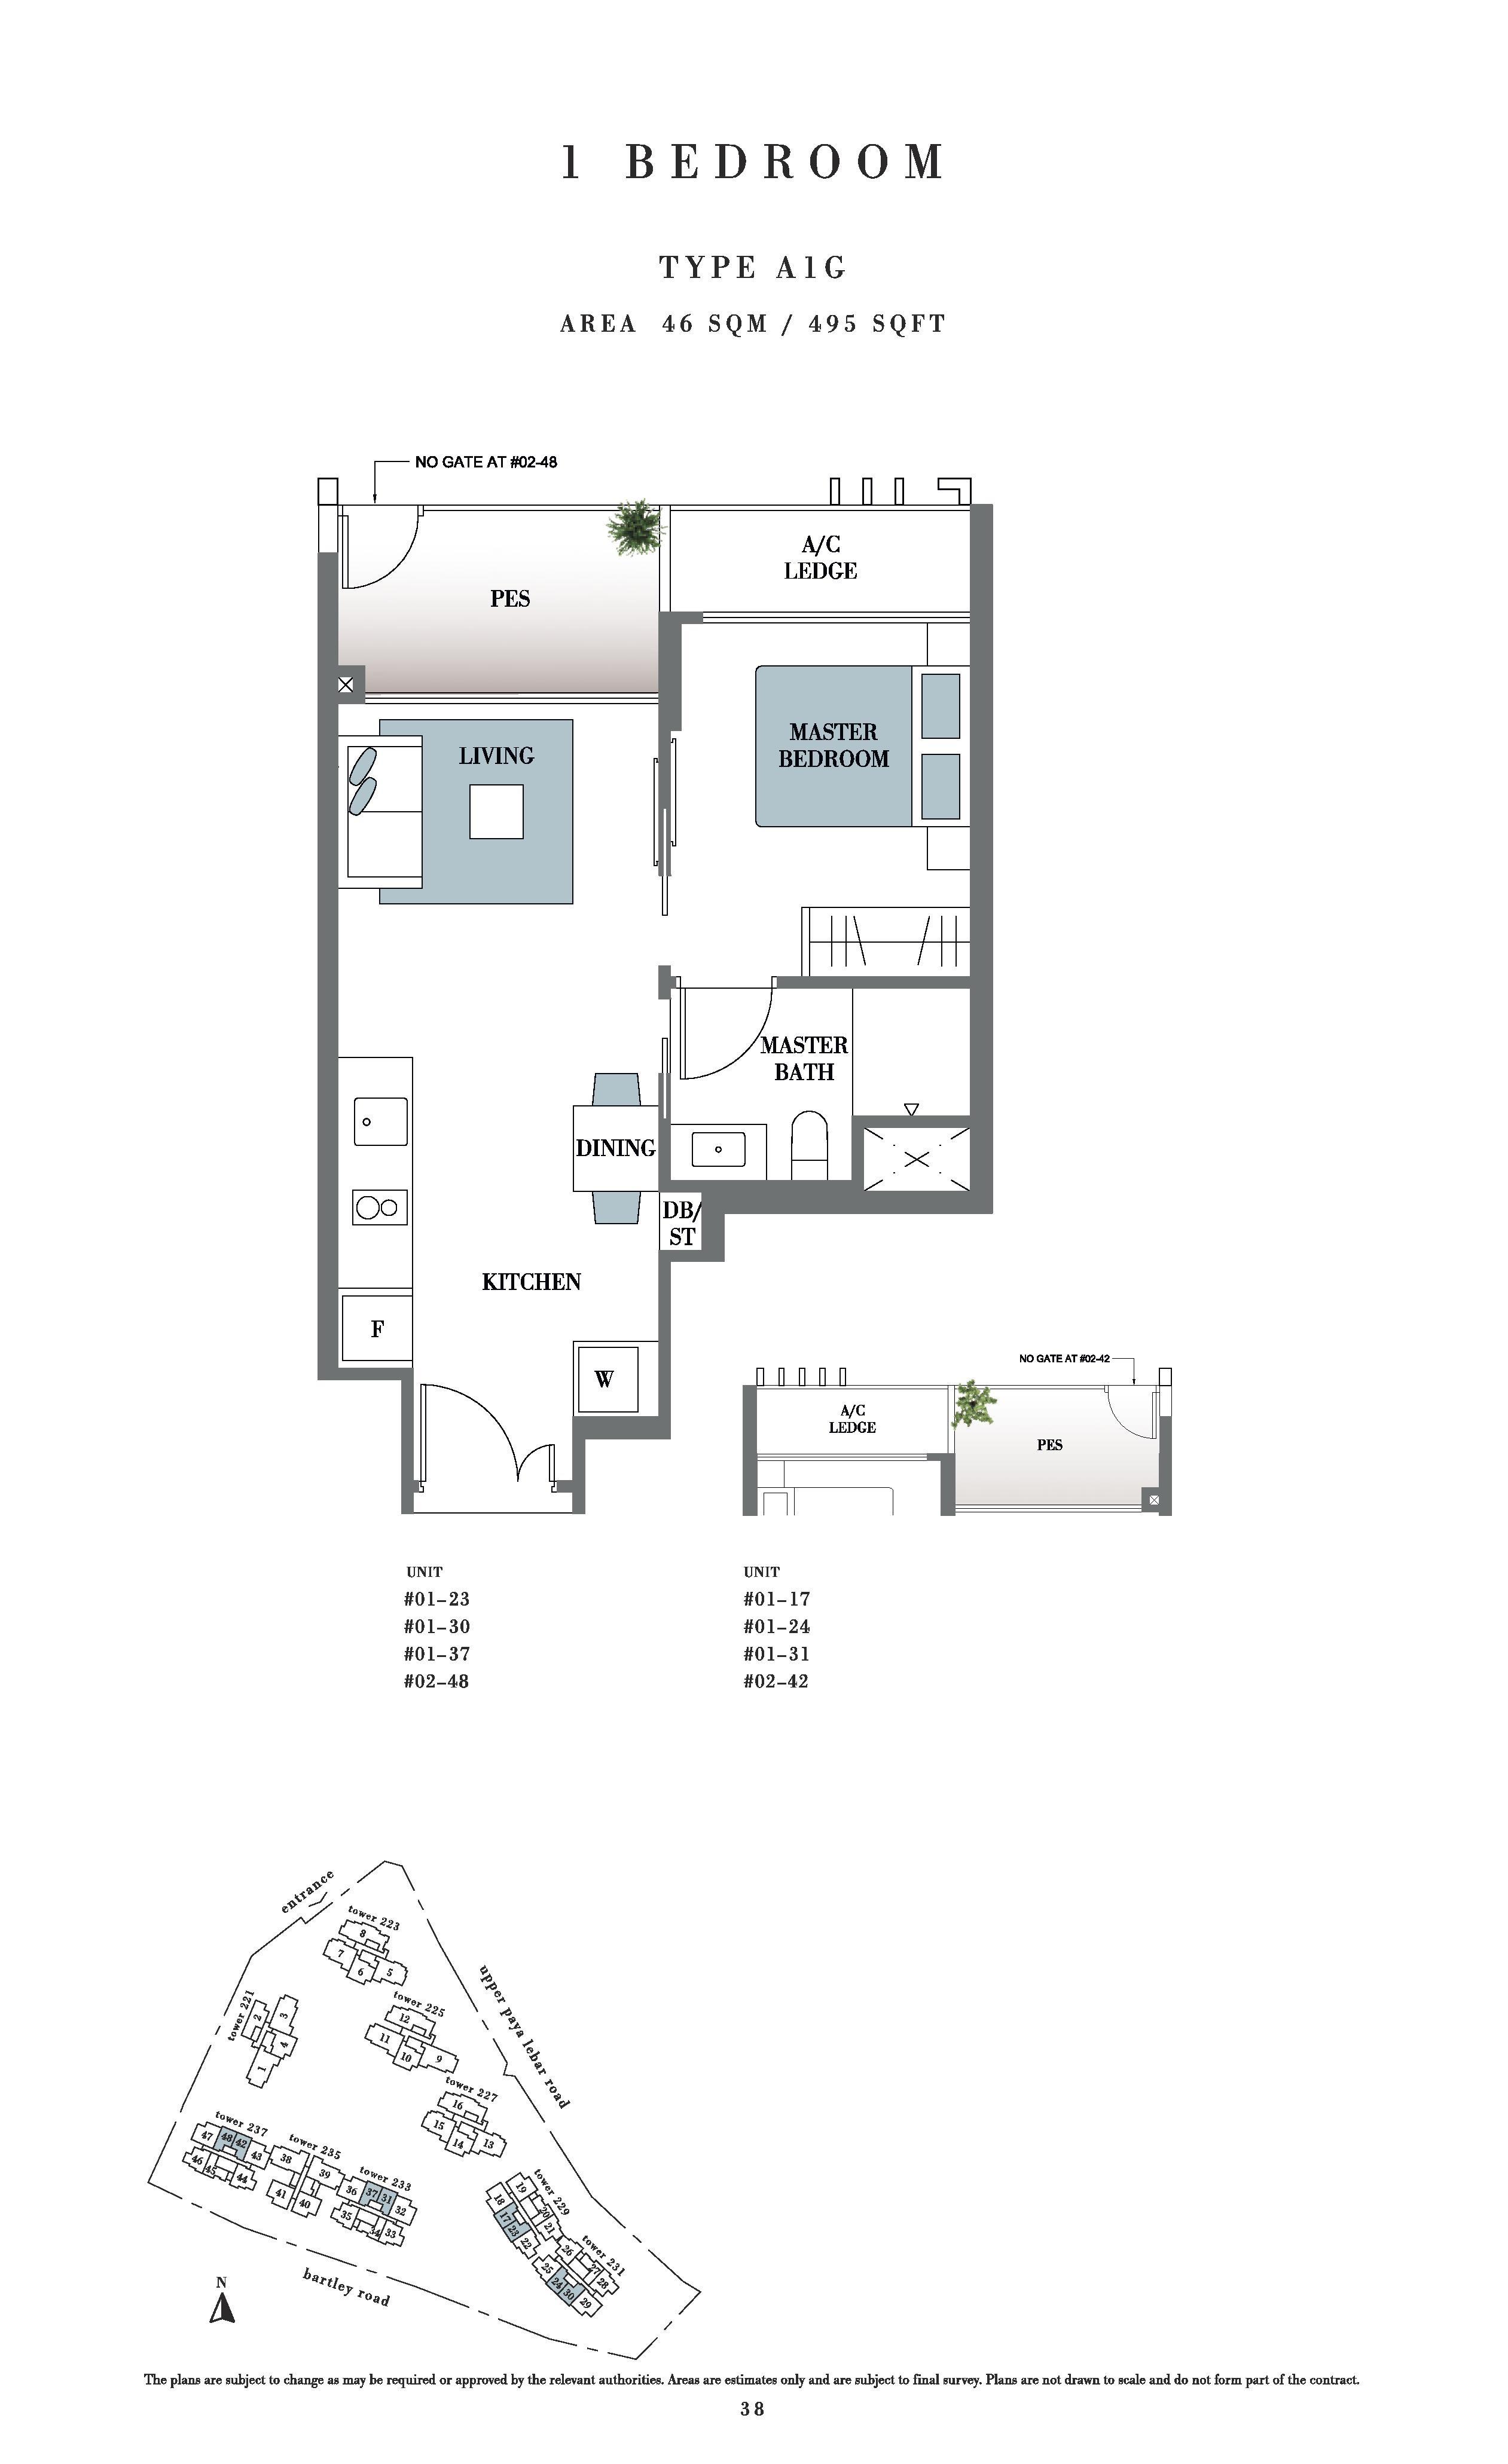 Botanique @ bartley 1 Bedroom PES Floor Plans Type A1G